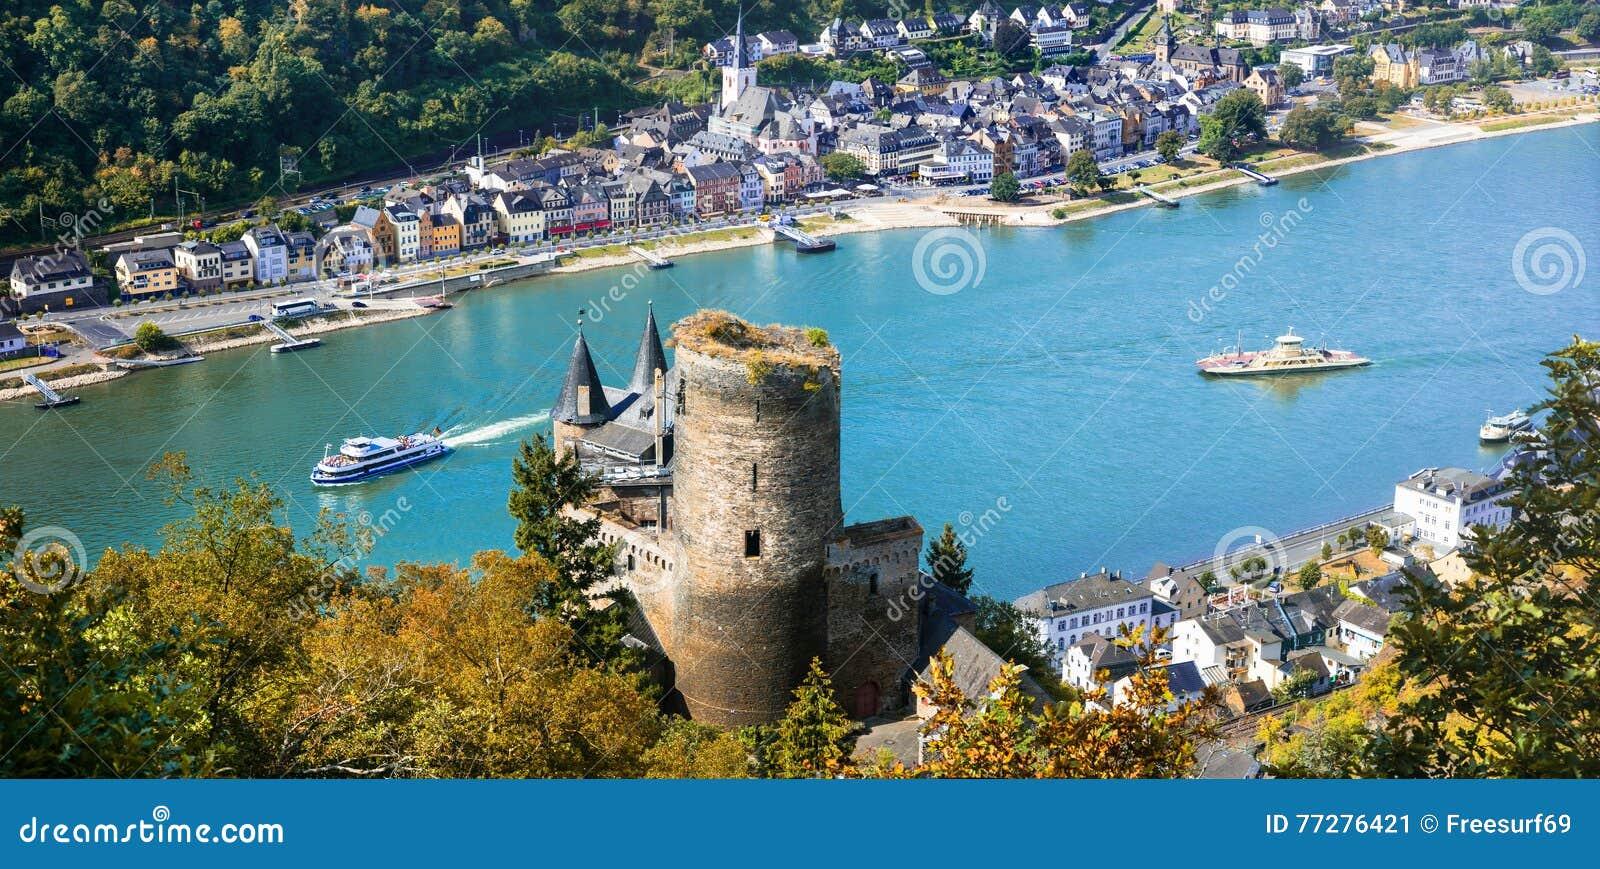 Castelos românticos bonitos do rio de Rhein vista do castelo a de Katz